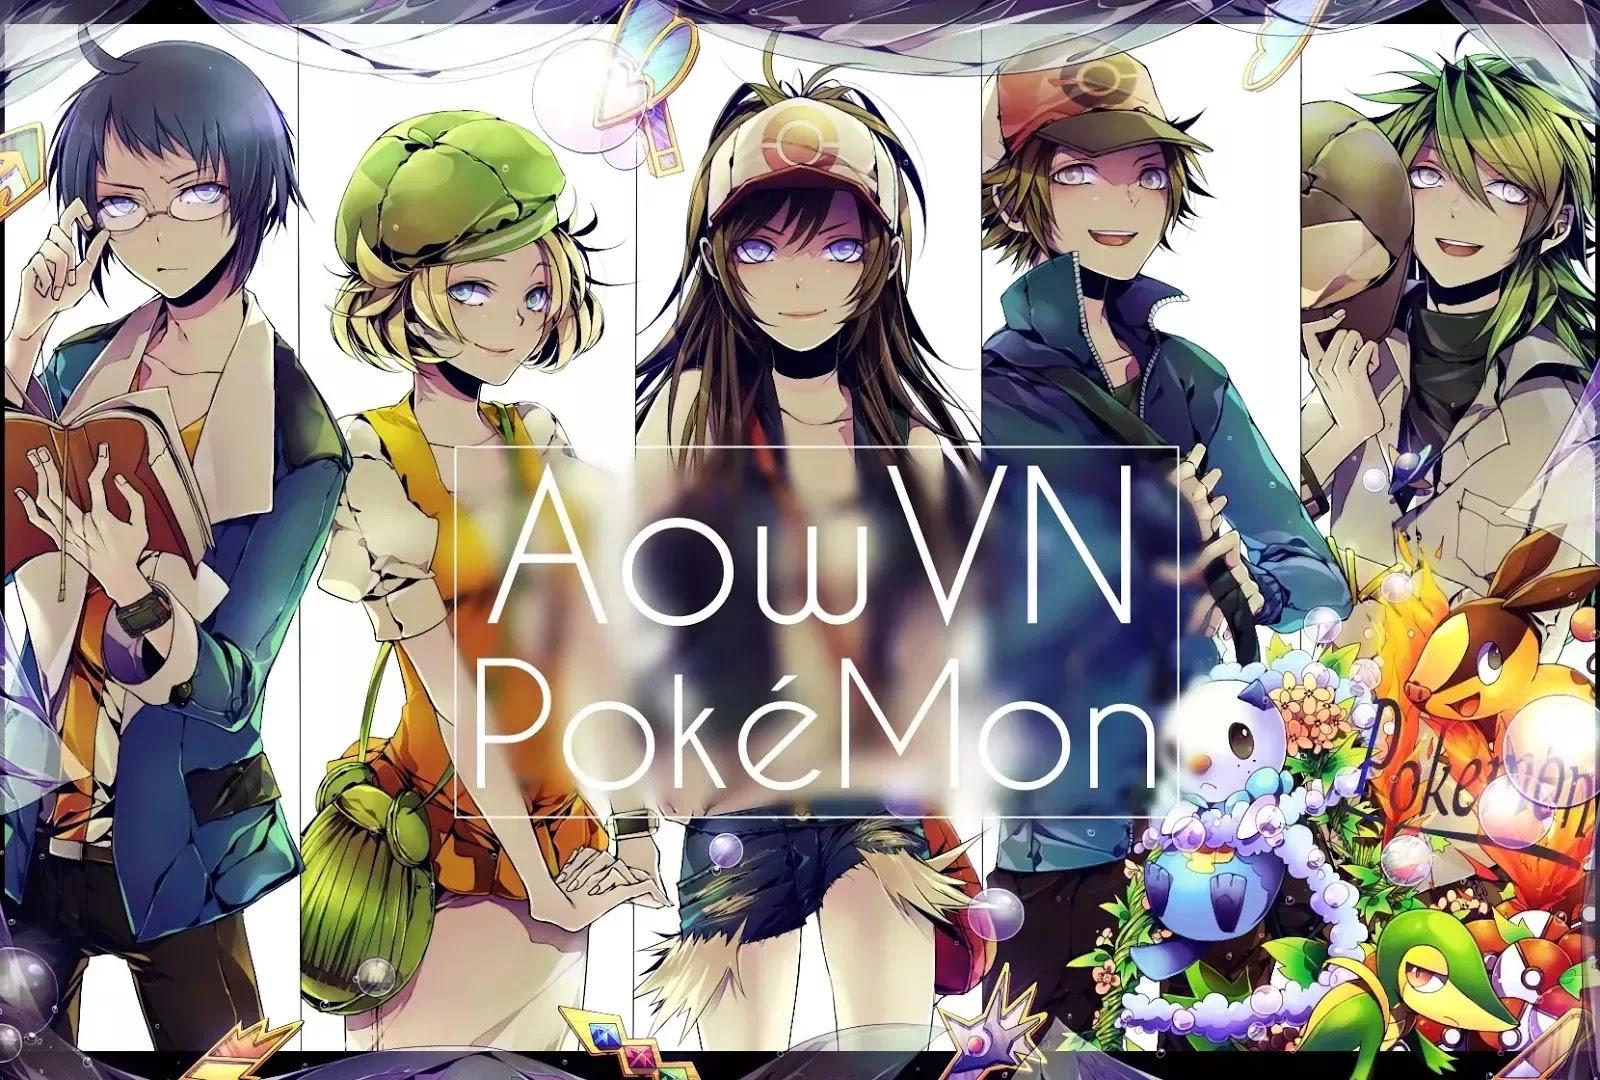 AowVN Pokemon minz%2B%25284%2529 - [ NDS ] Pokémon White & Pokémon Black 2 Việt Hóa 100% | Giả Lập Android , PC , IOS - UPDATE